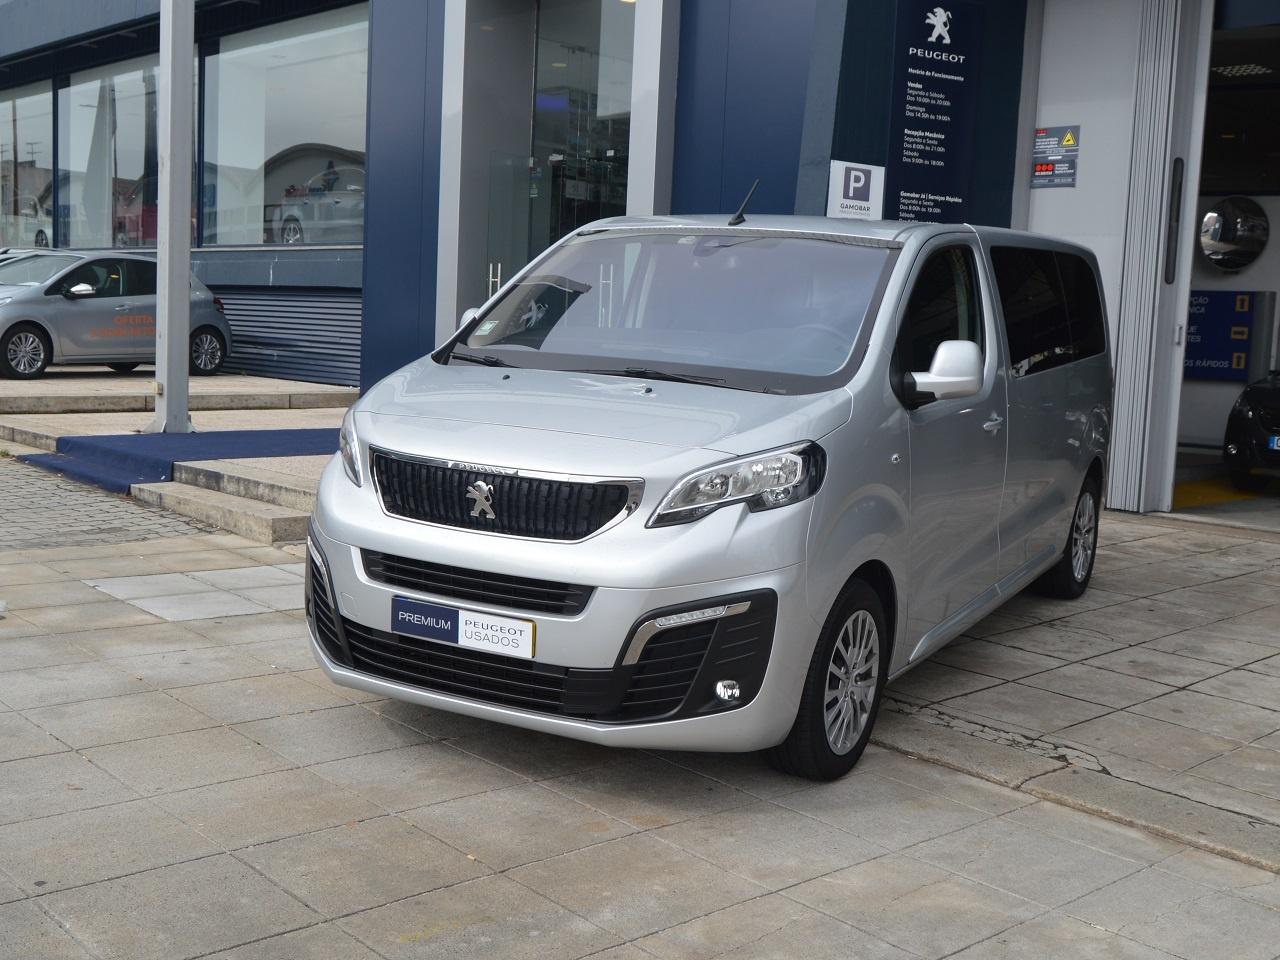 Peugeot Traveller Active Standard (L2) 1.6 BlueHdi 115cv CVM6